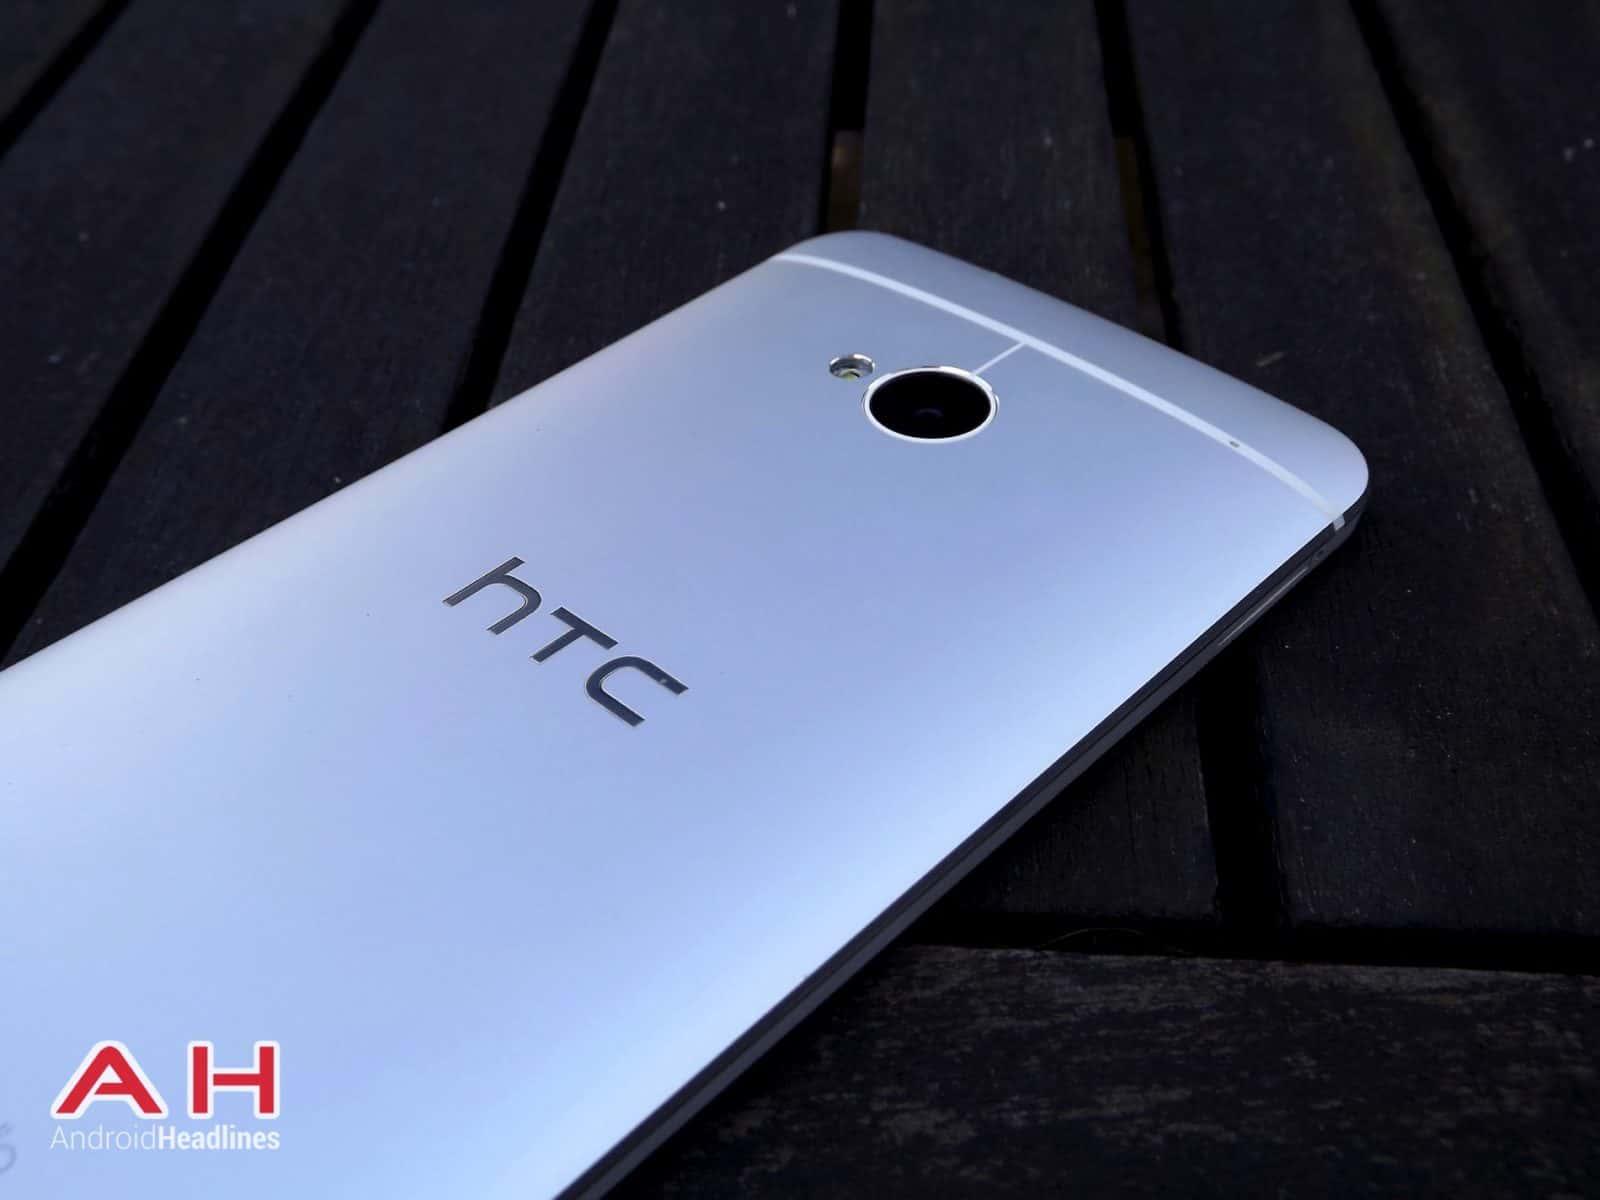 HTC One M7 HD AH 09